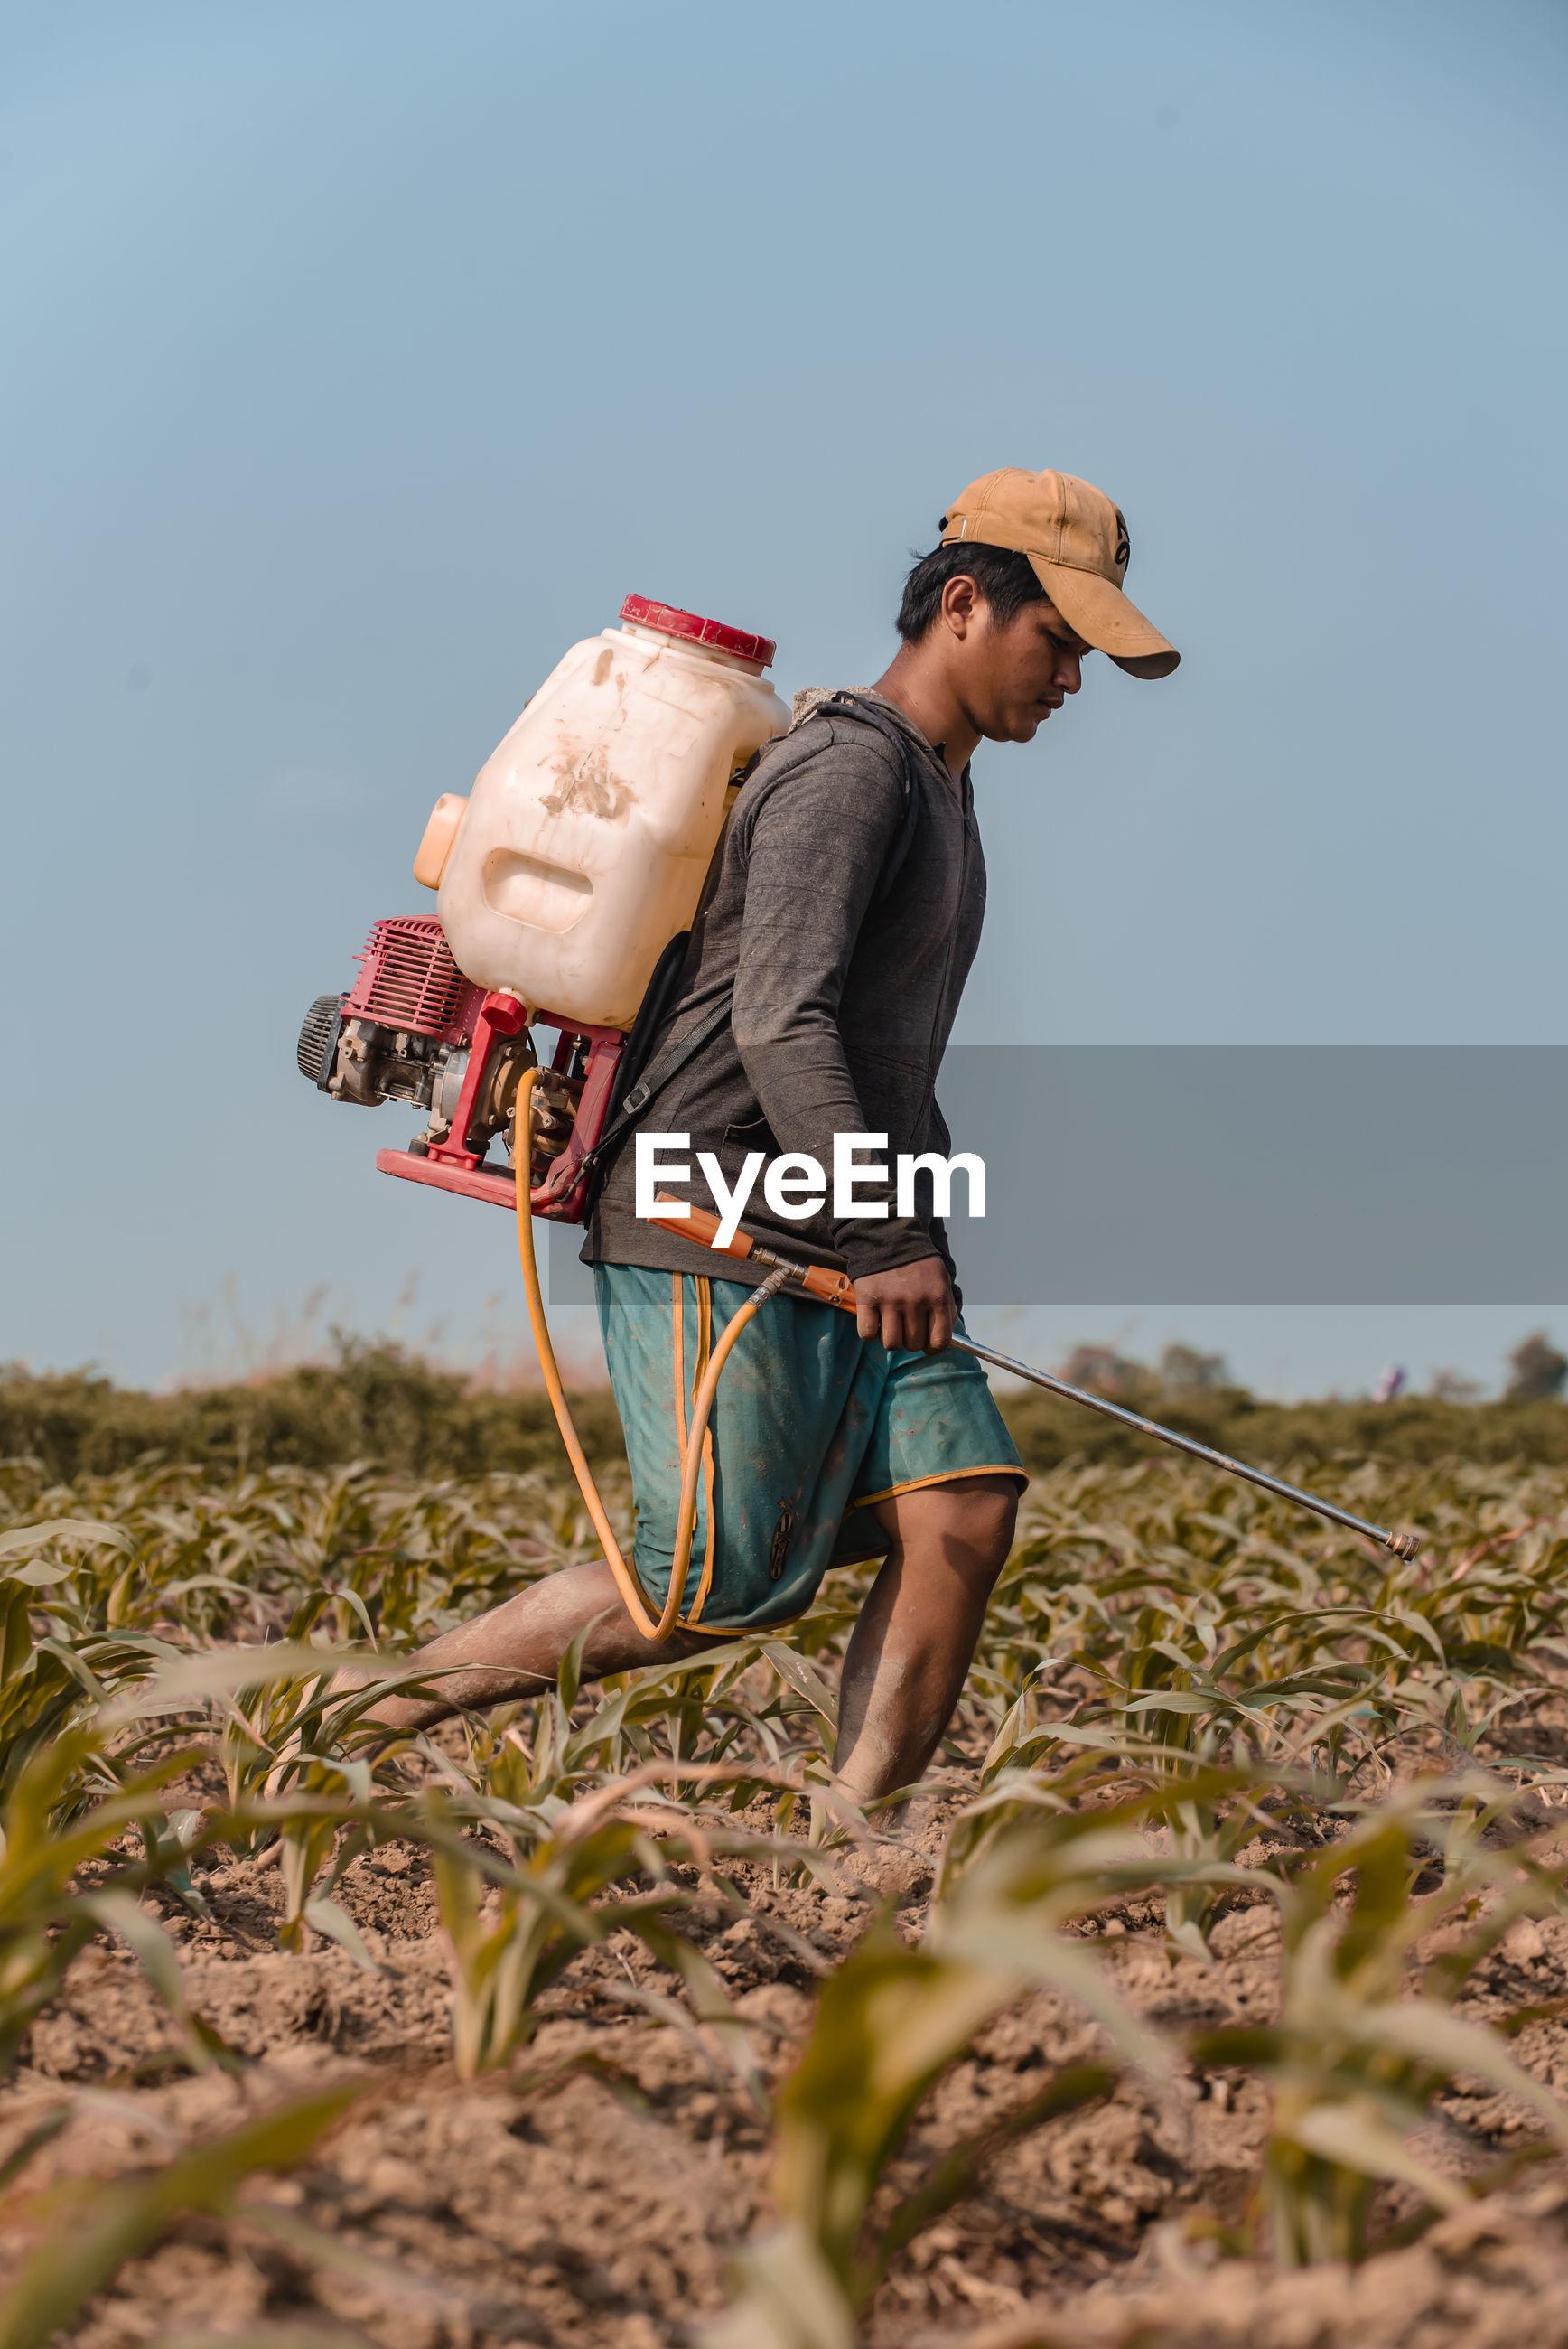 Farmer spraying pesticide on agricultural field against clear sky